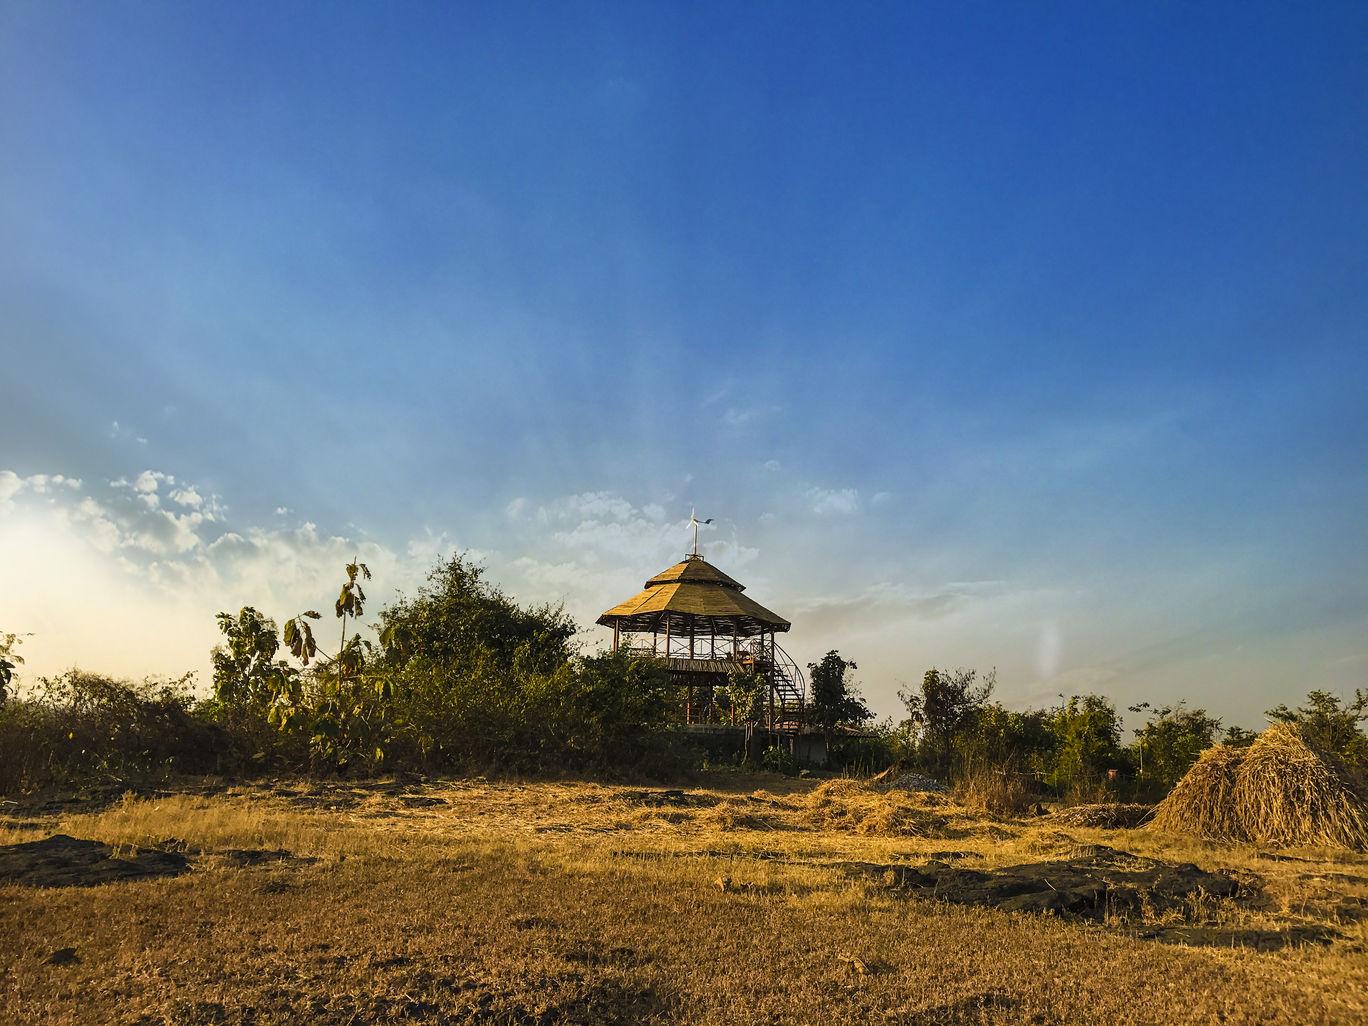 Photo of Camping near #Imagica - Khopoli By Bigfoot Stay